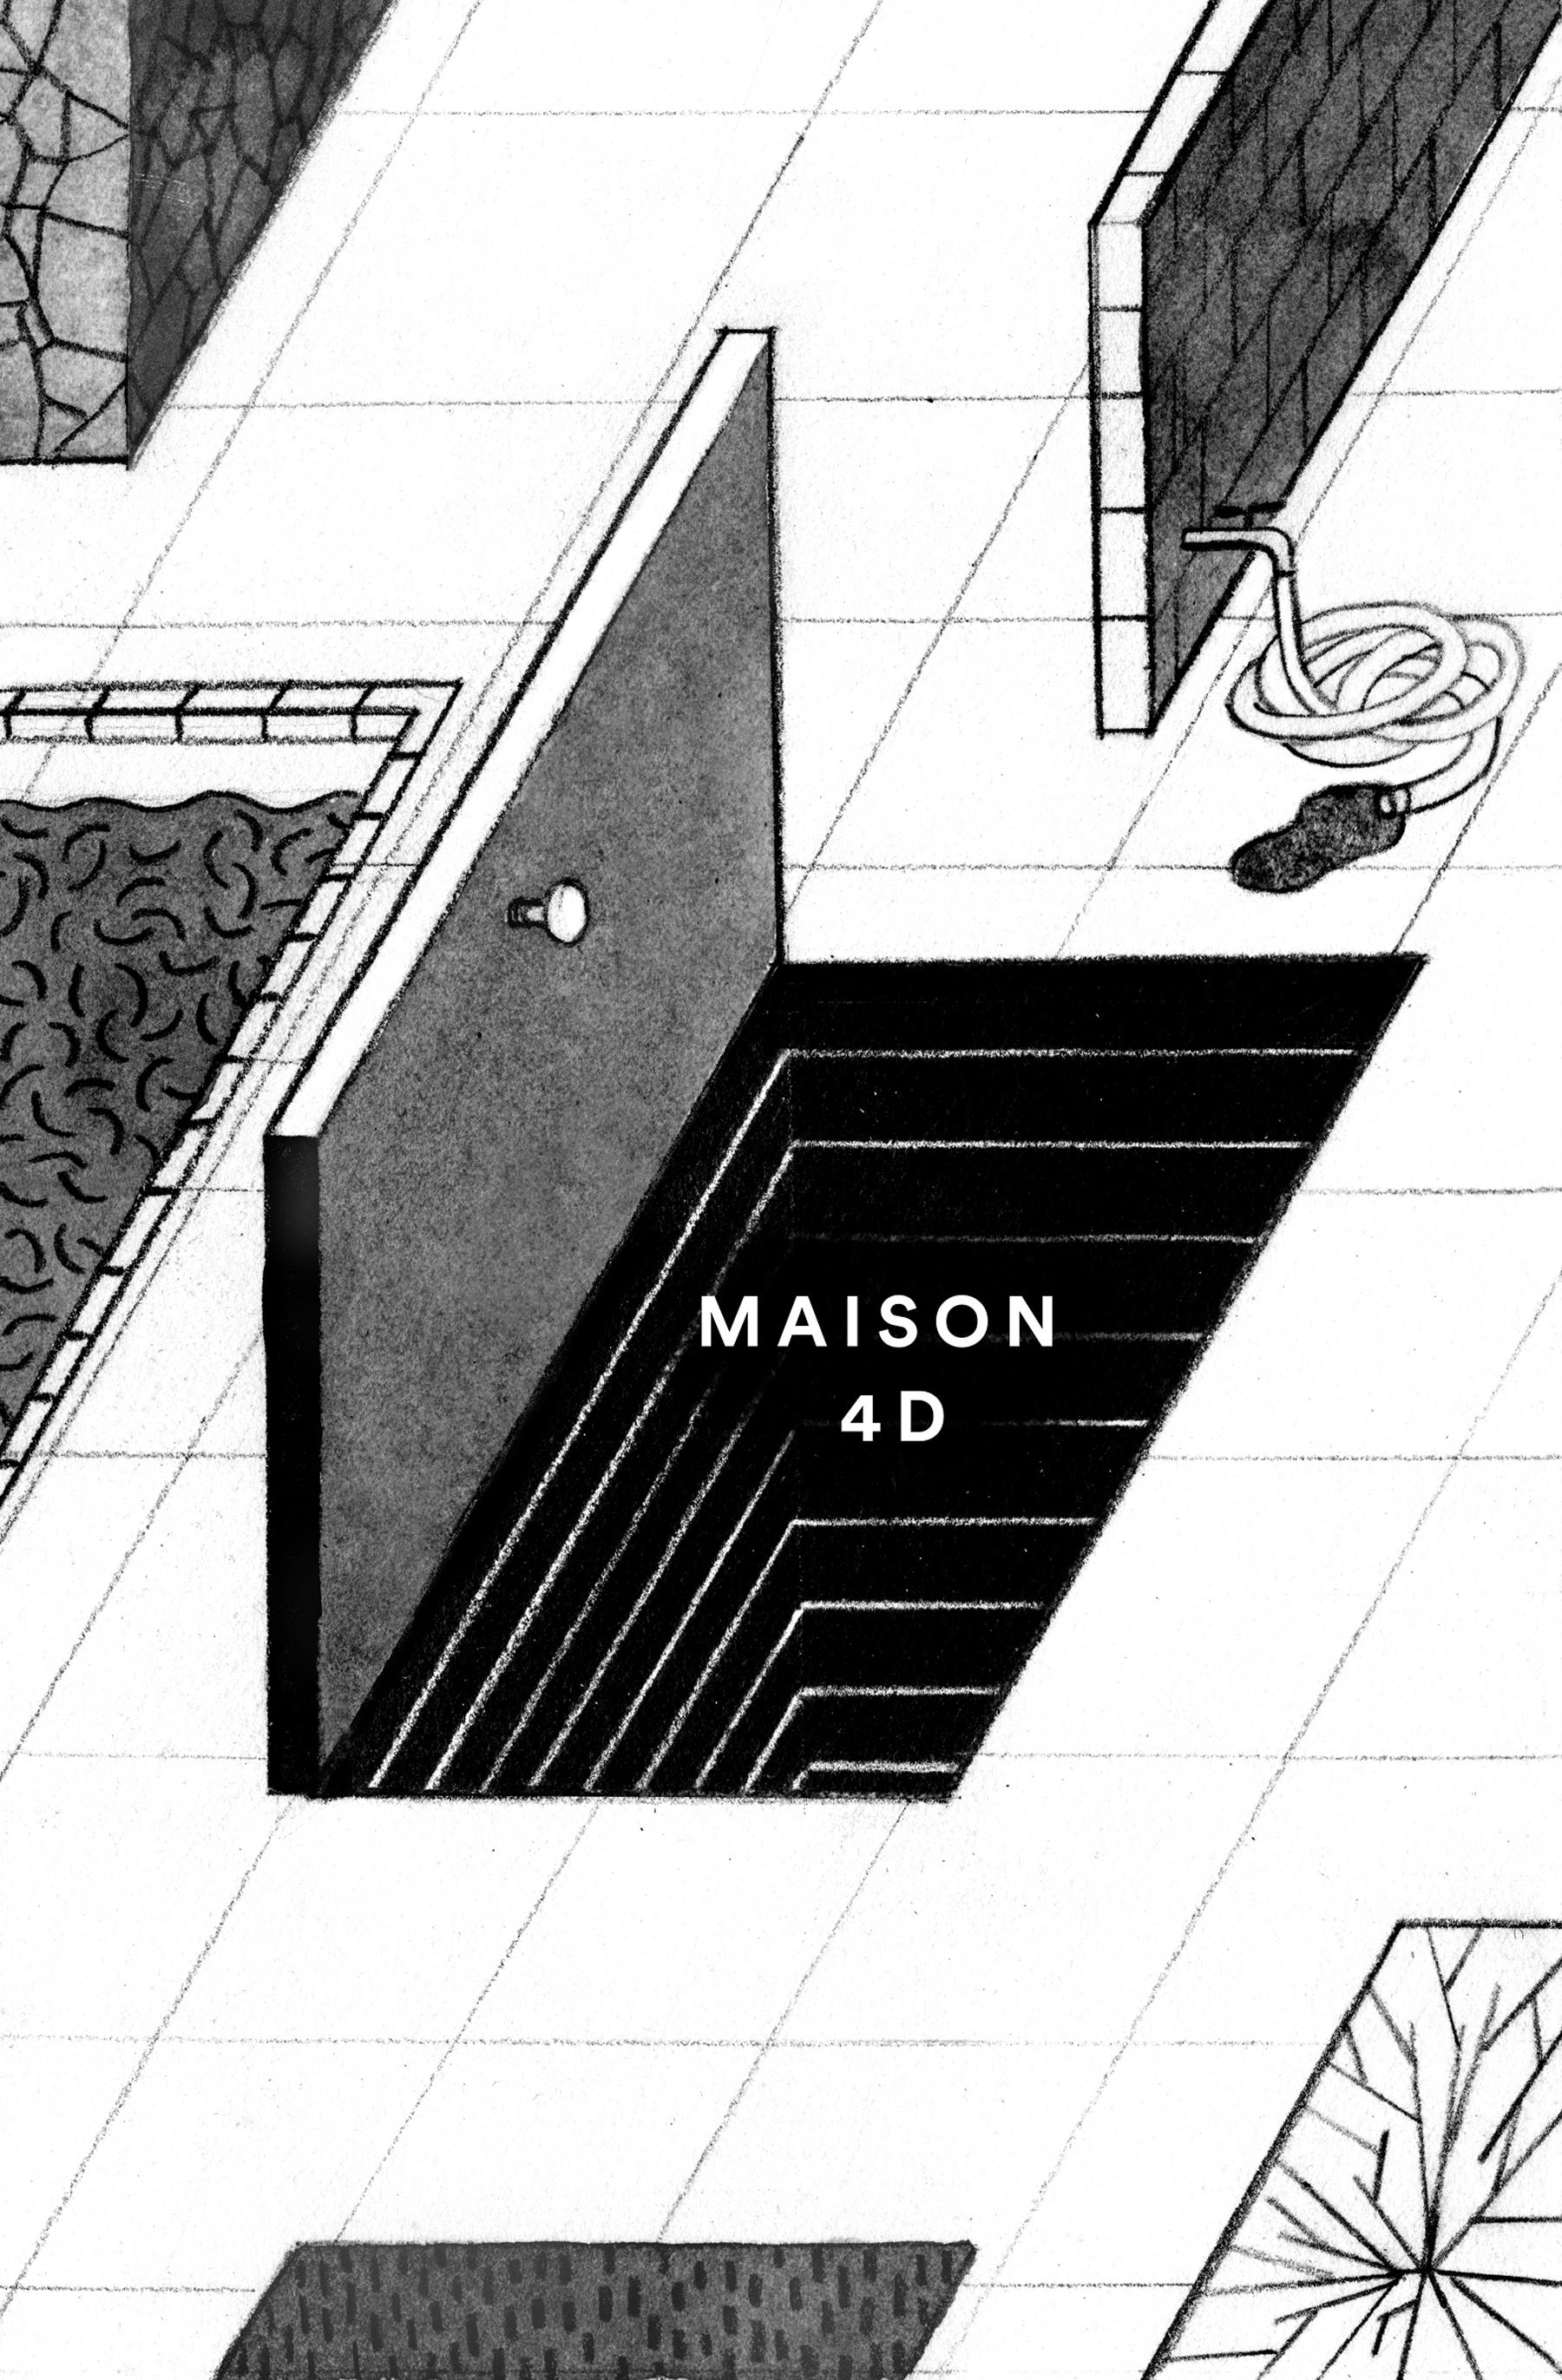 MaisonBW_01.jpg